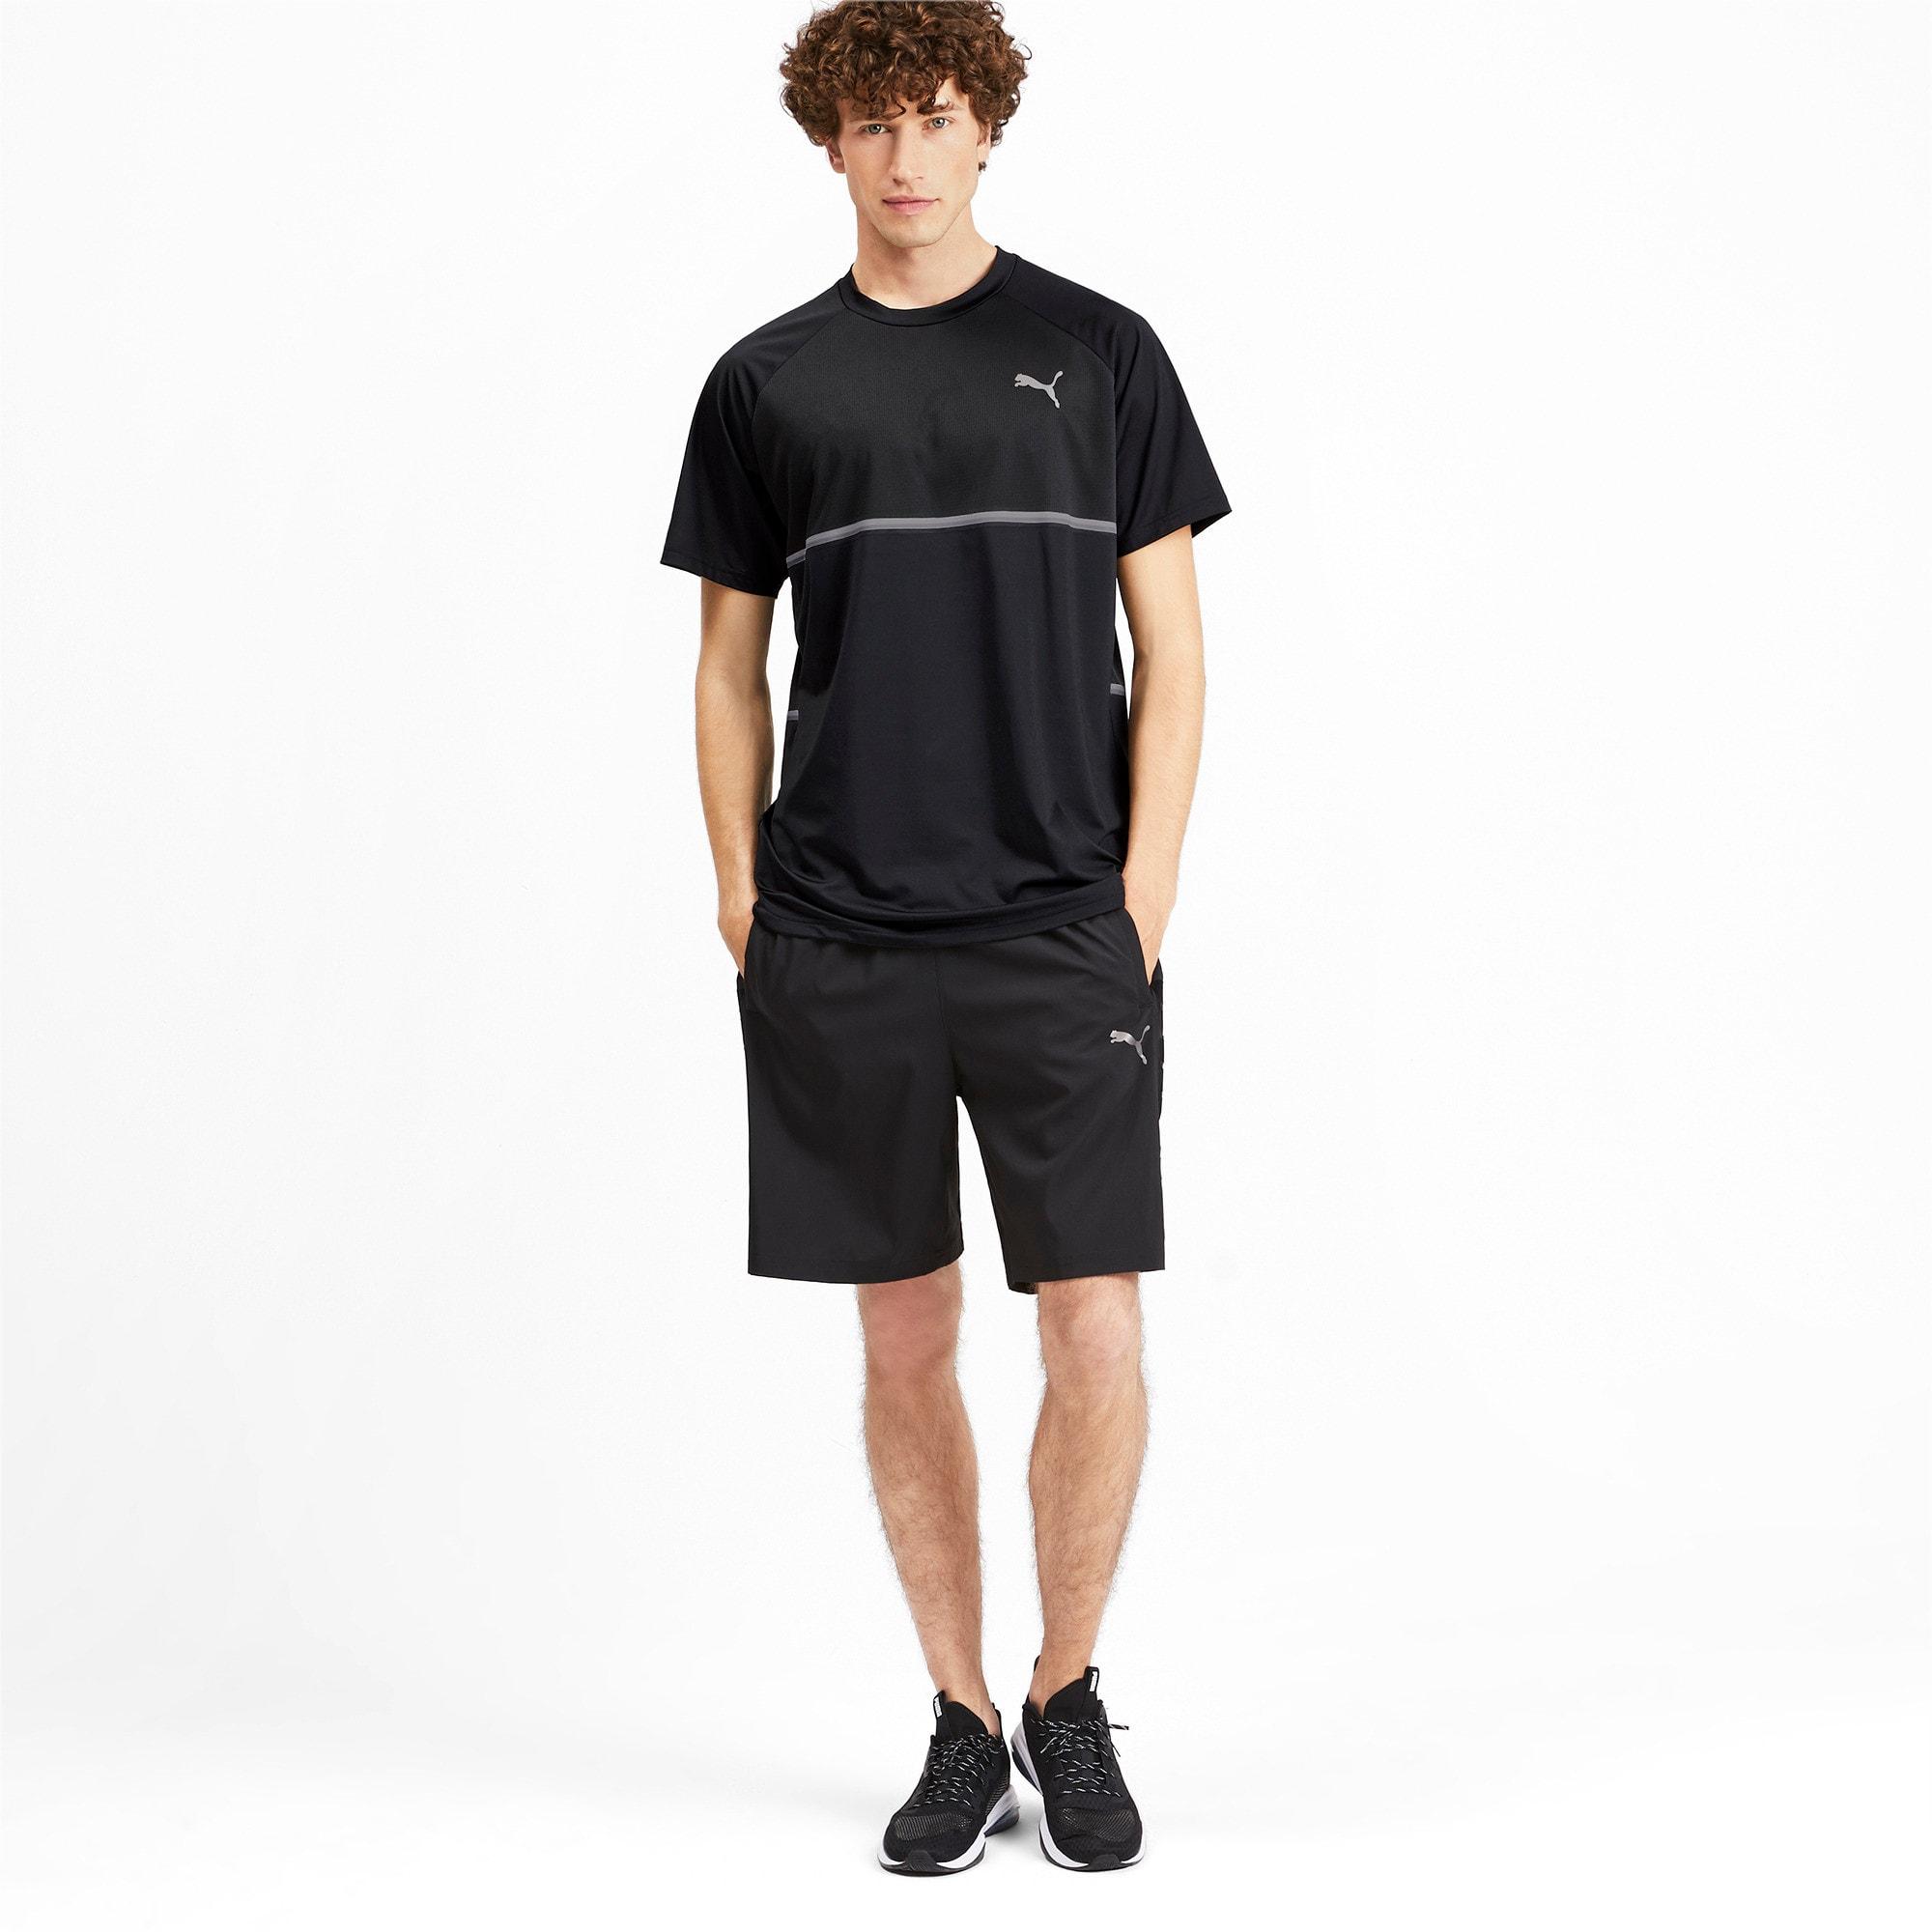 Thumbnail 3 of Power BND T-shirt voor heren, Puma Black, medium